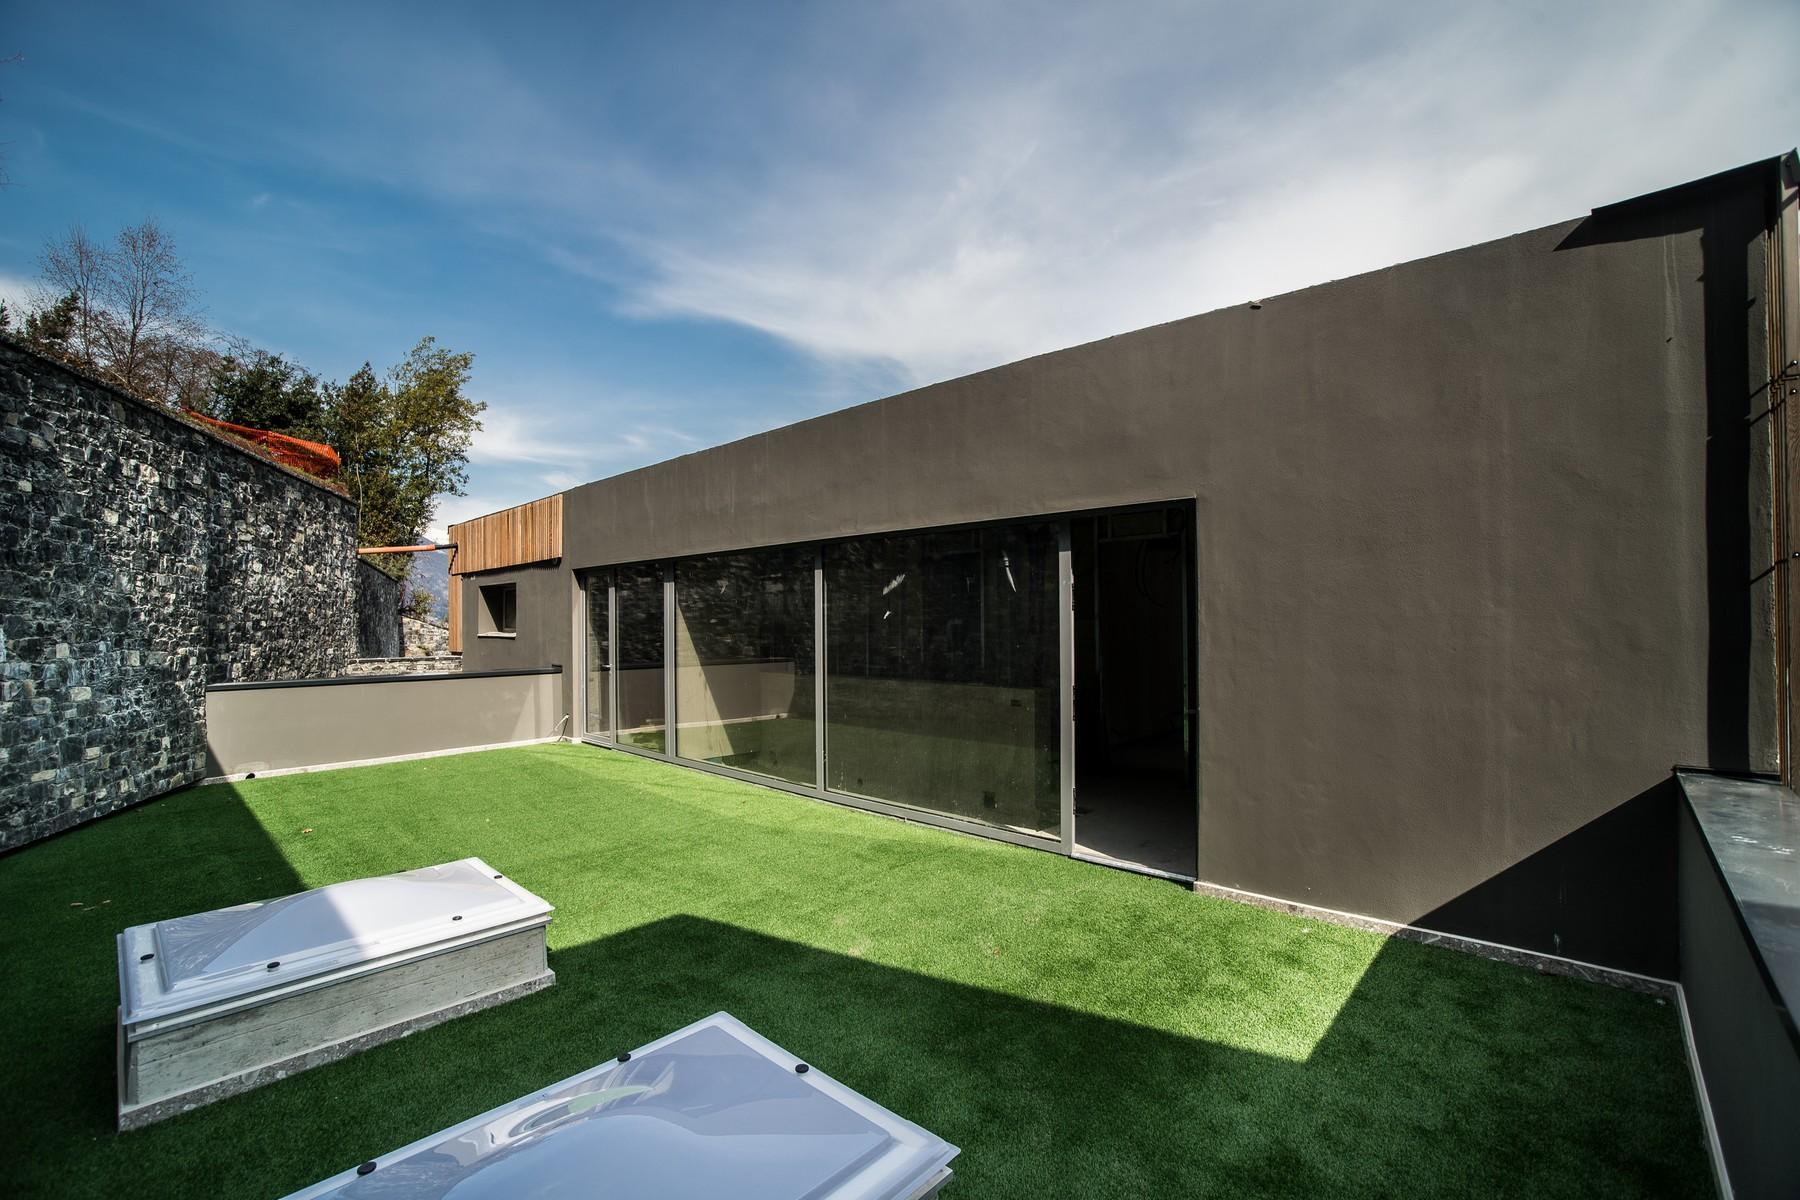 Additional photo for property listing at Prestigious modern villa with private swimming pool and magnificent Lake views Laglio Laglio, Como 22010 Italie